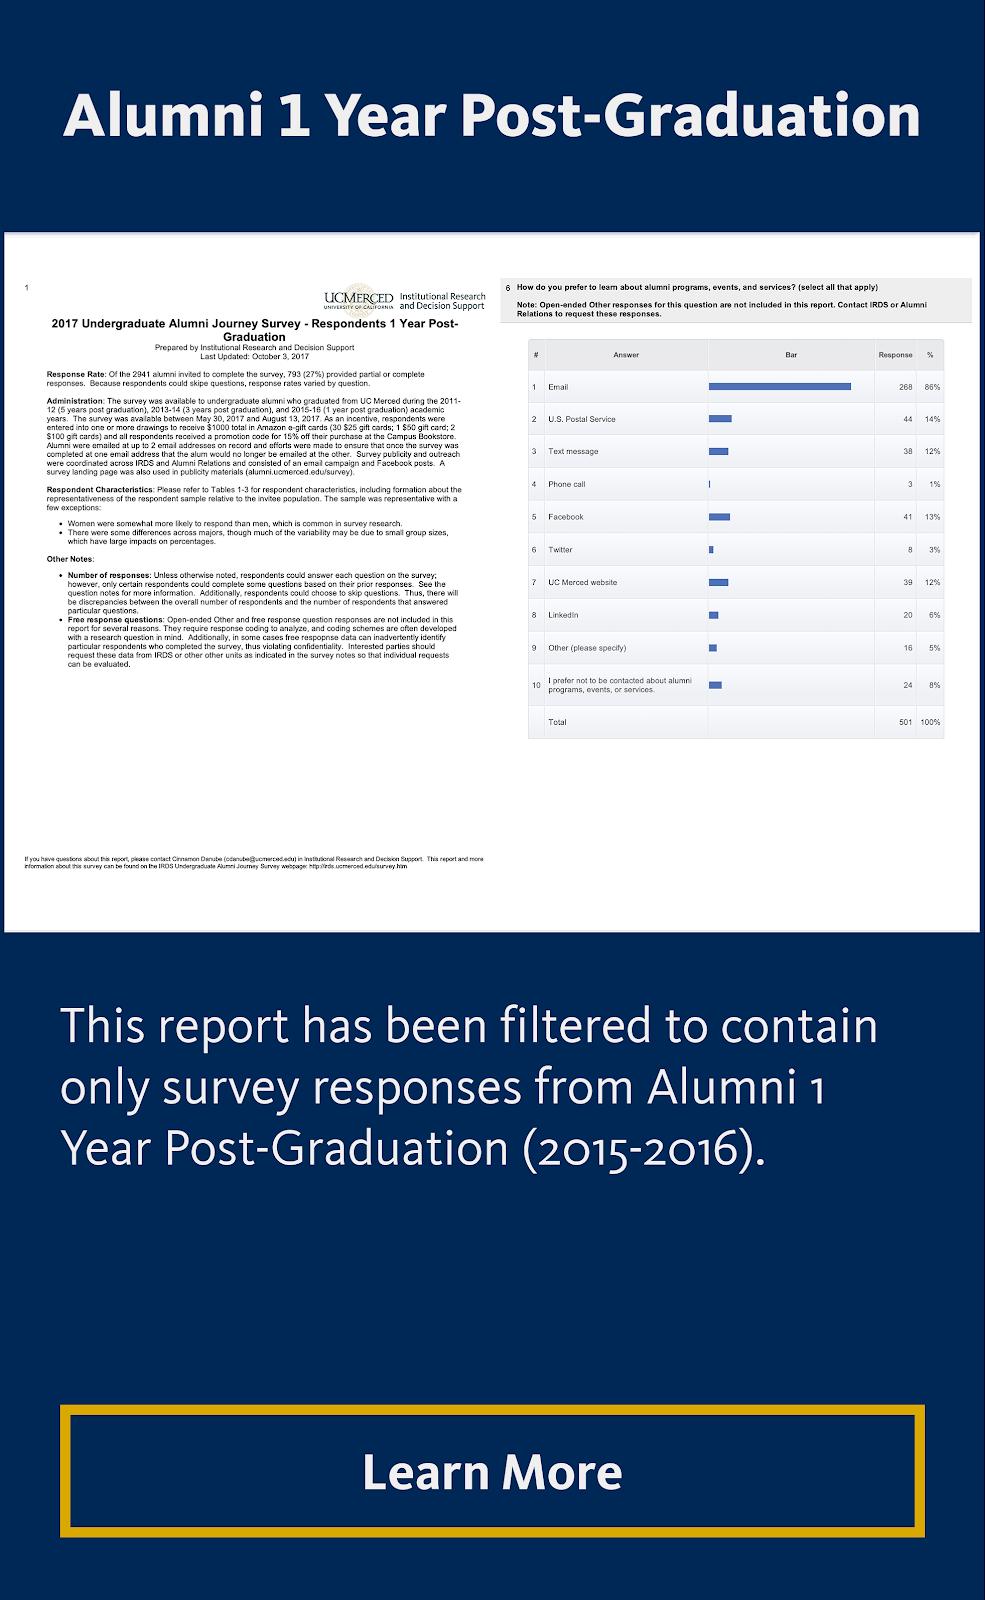 2017 Alumni 1 Year Post-Graduation